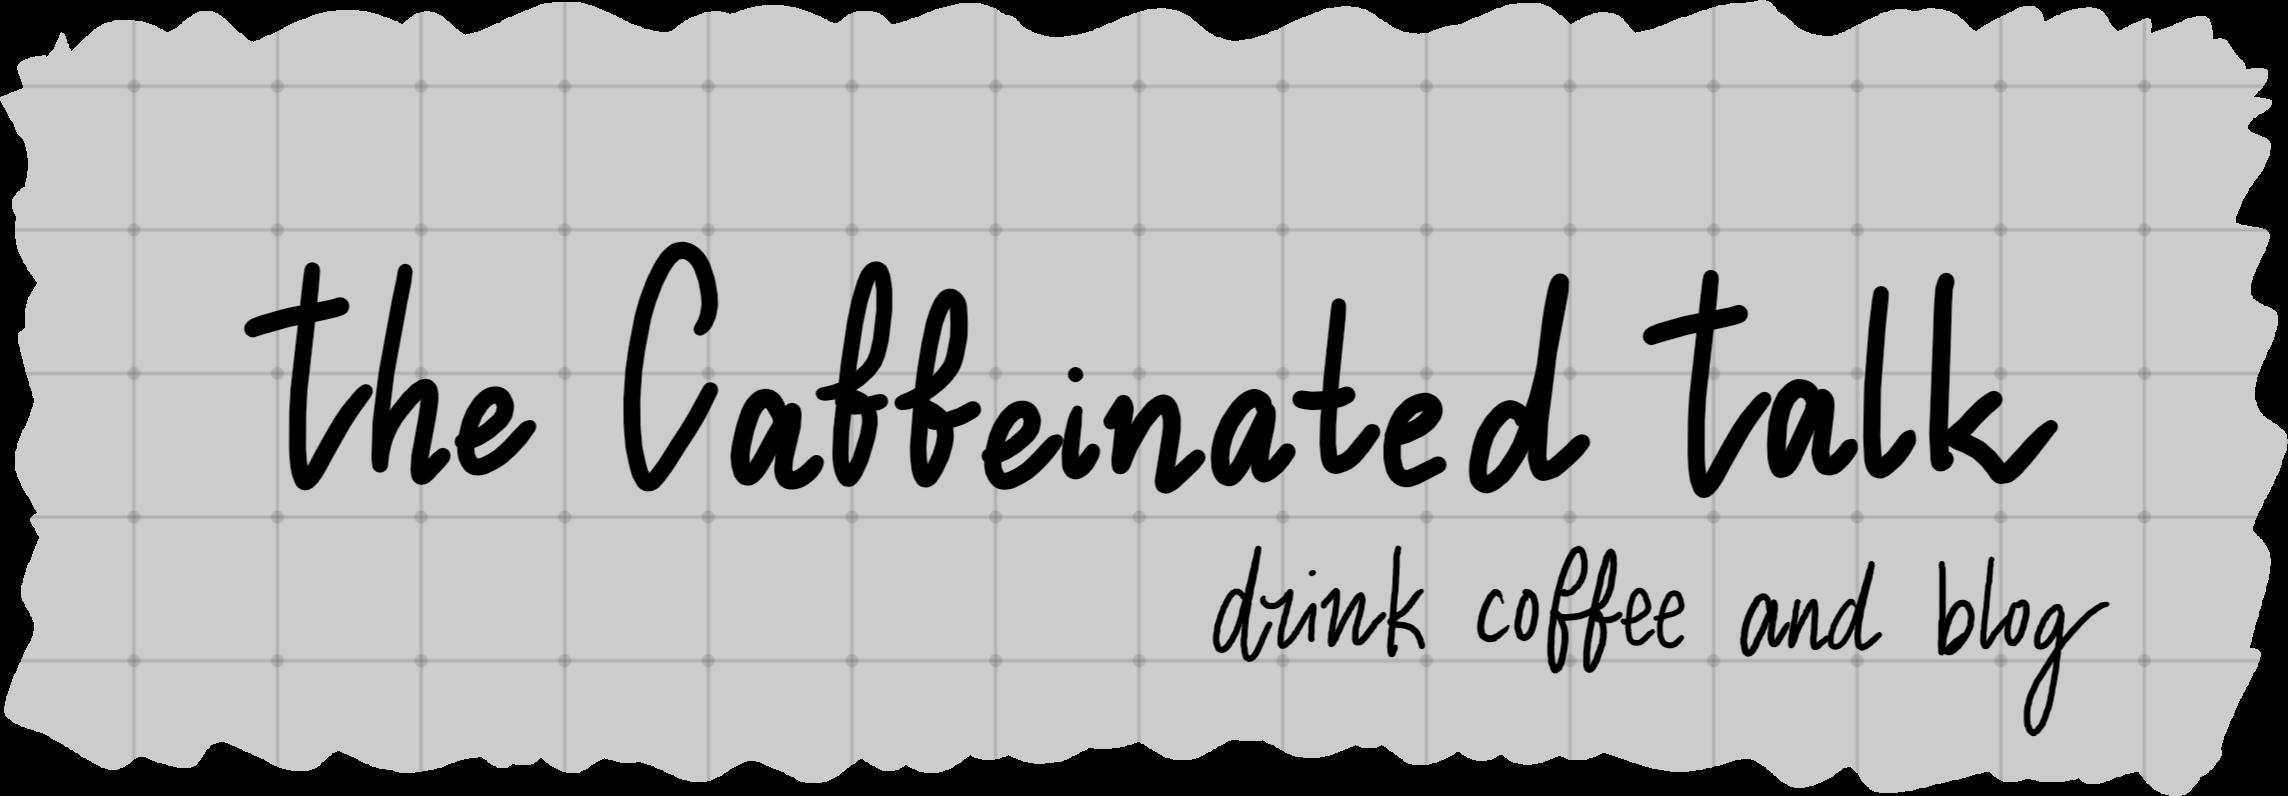 The Caffeinated Talk